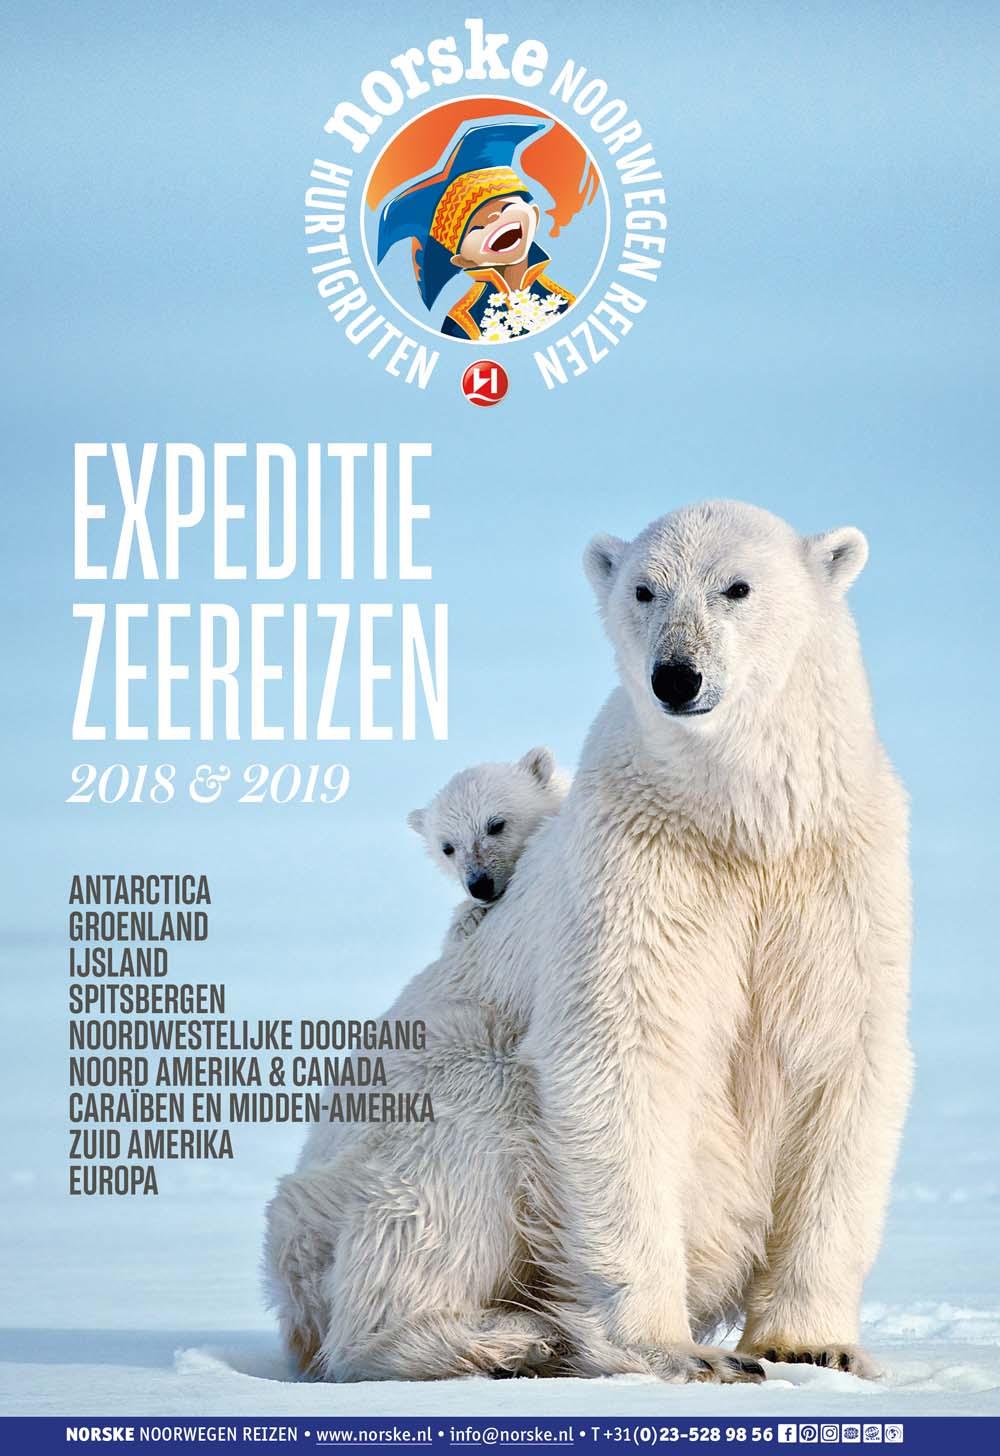 Hurtigruten Expeditie-Zeereizen 2018-2019